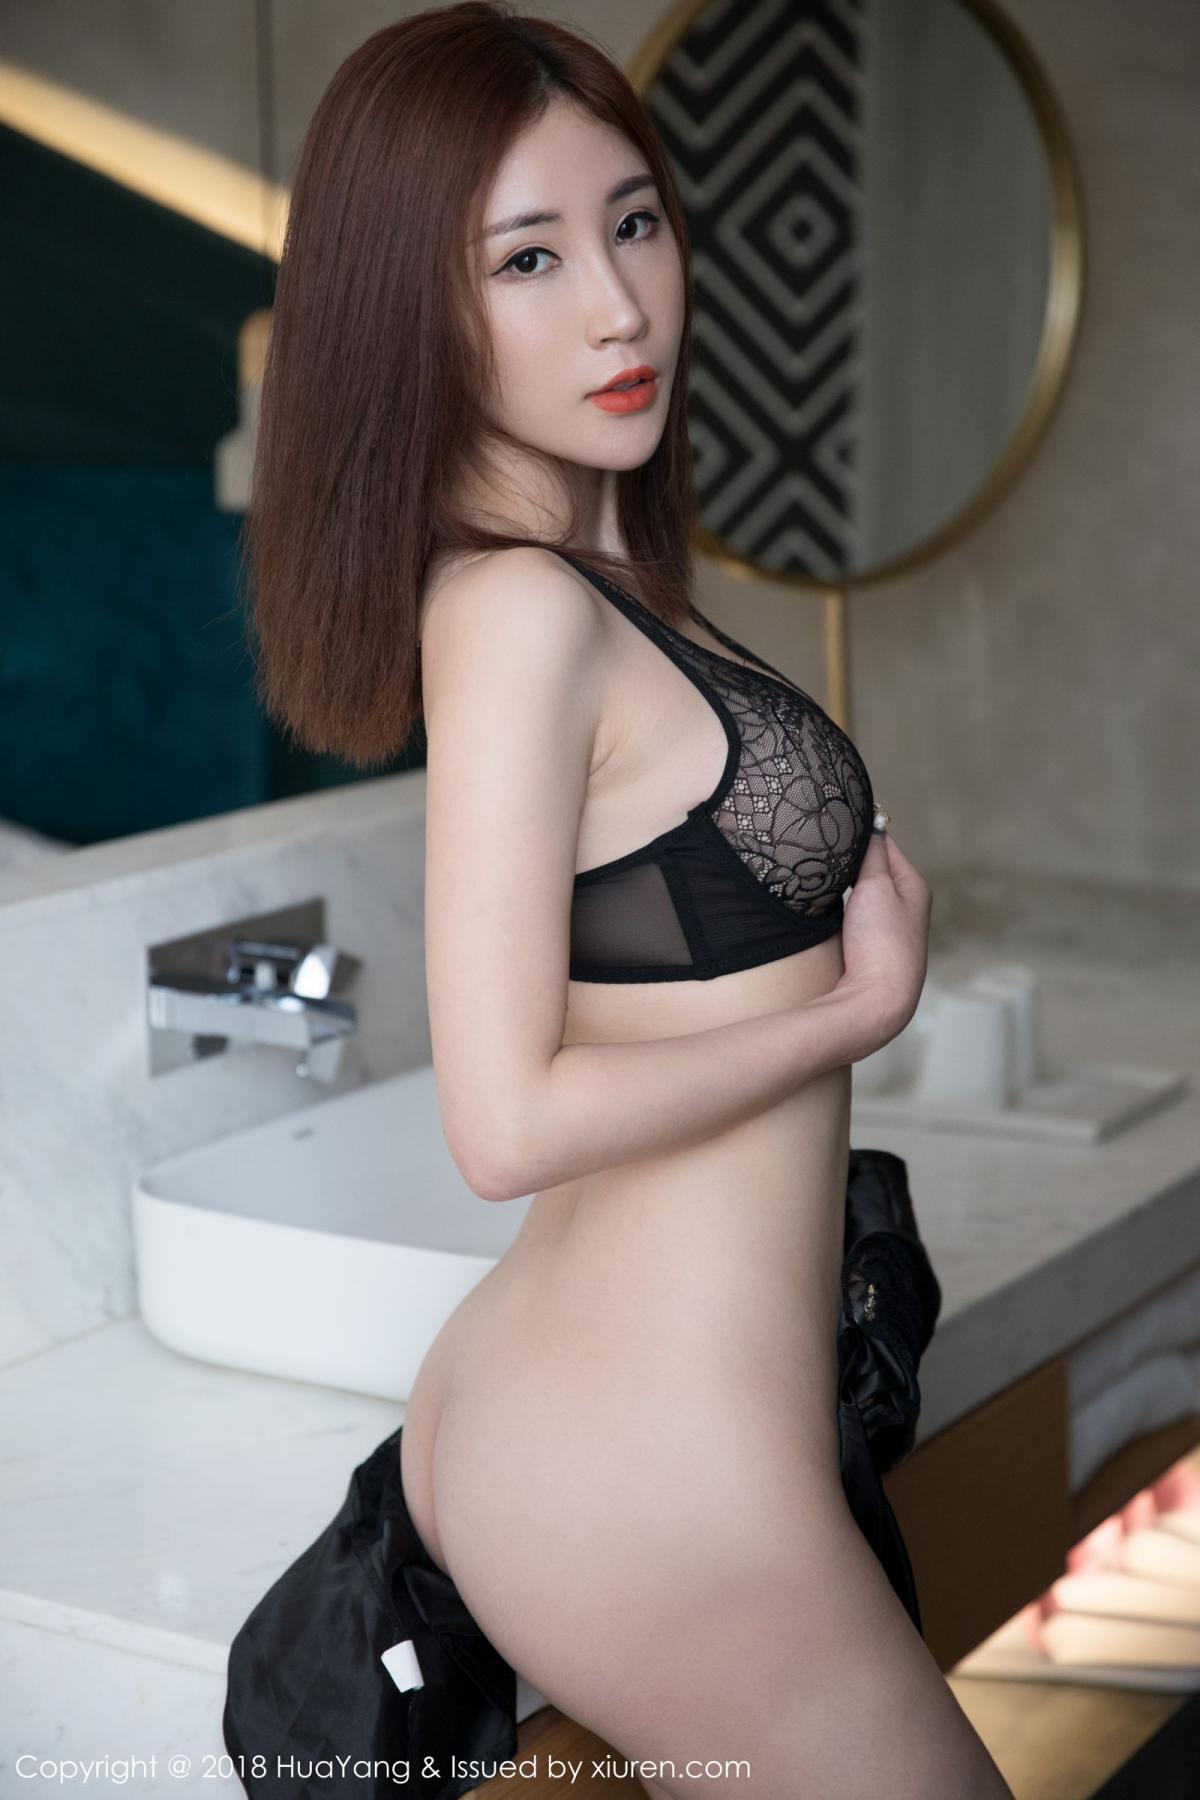 [Huayang] Vol.077 Sun Meng Yao 15P, Adult, Big Booty, HuaYang, Sun Meng Yao, Underwear